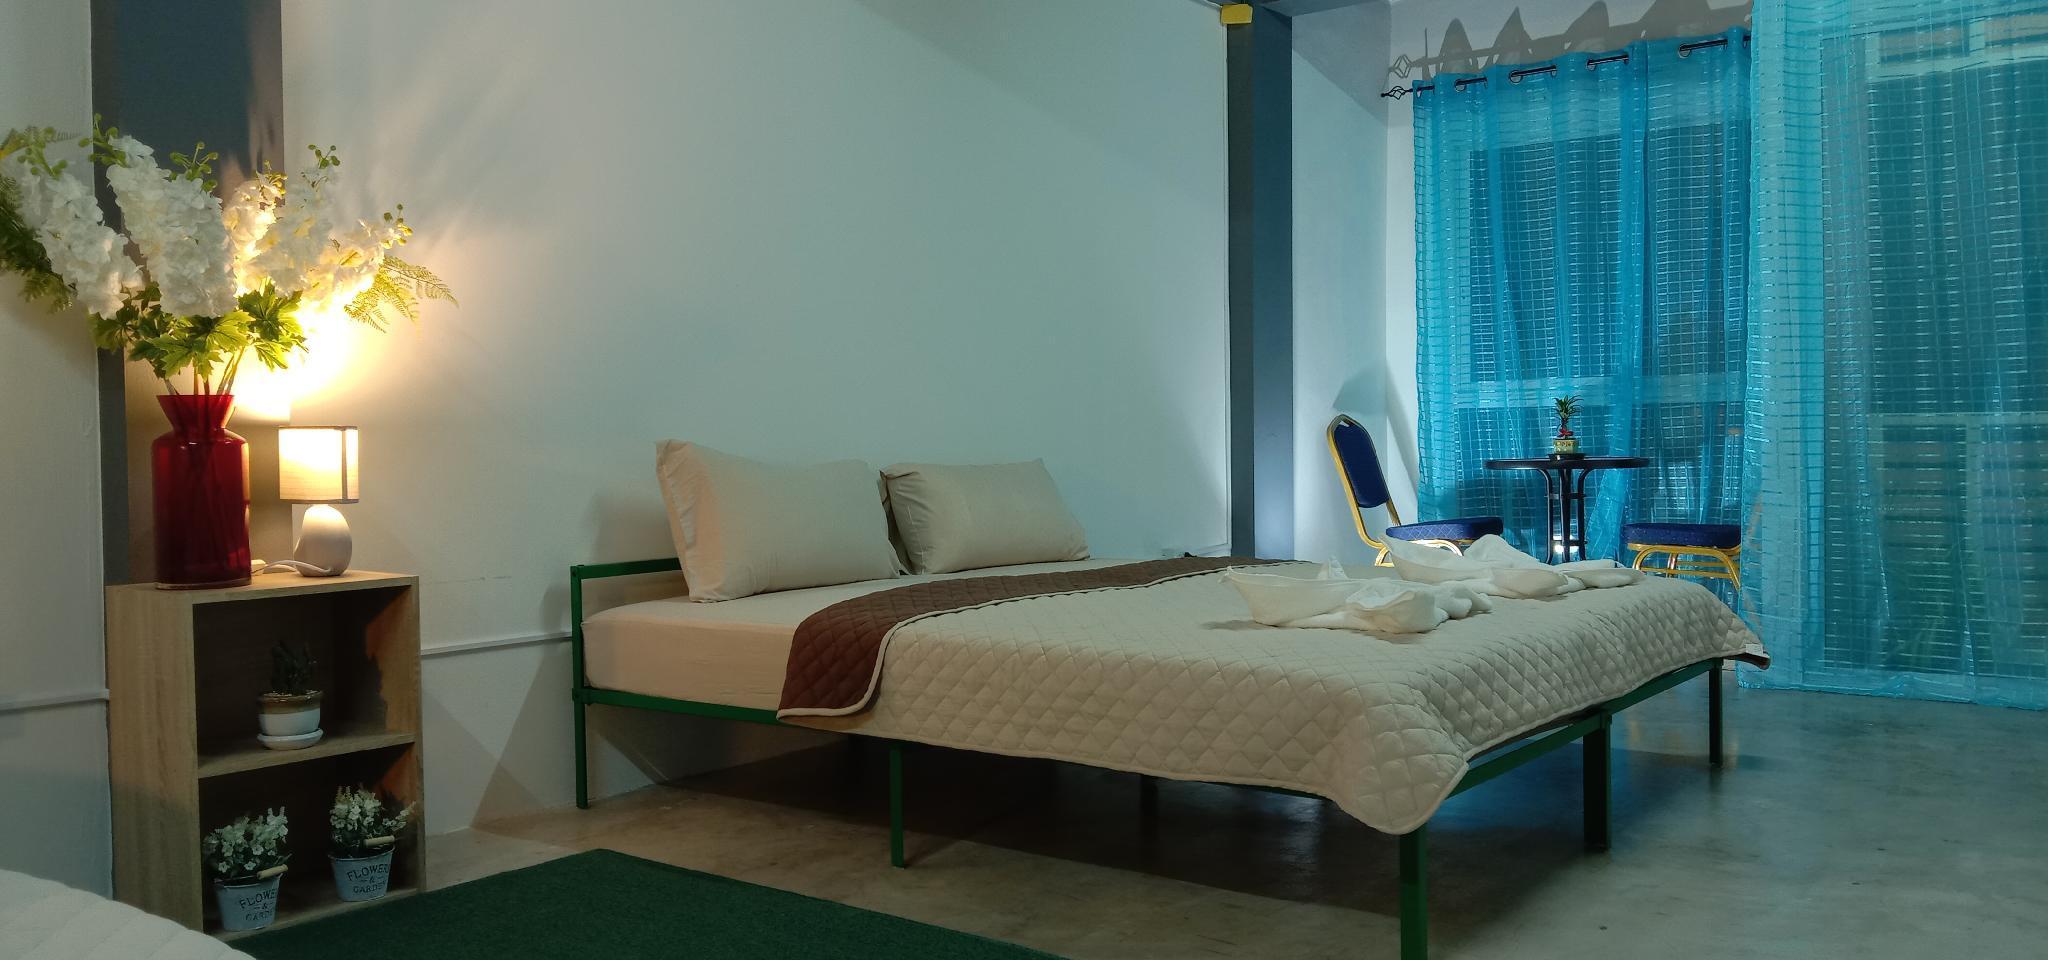 Yim Hostel Co. Ltd.